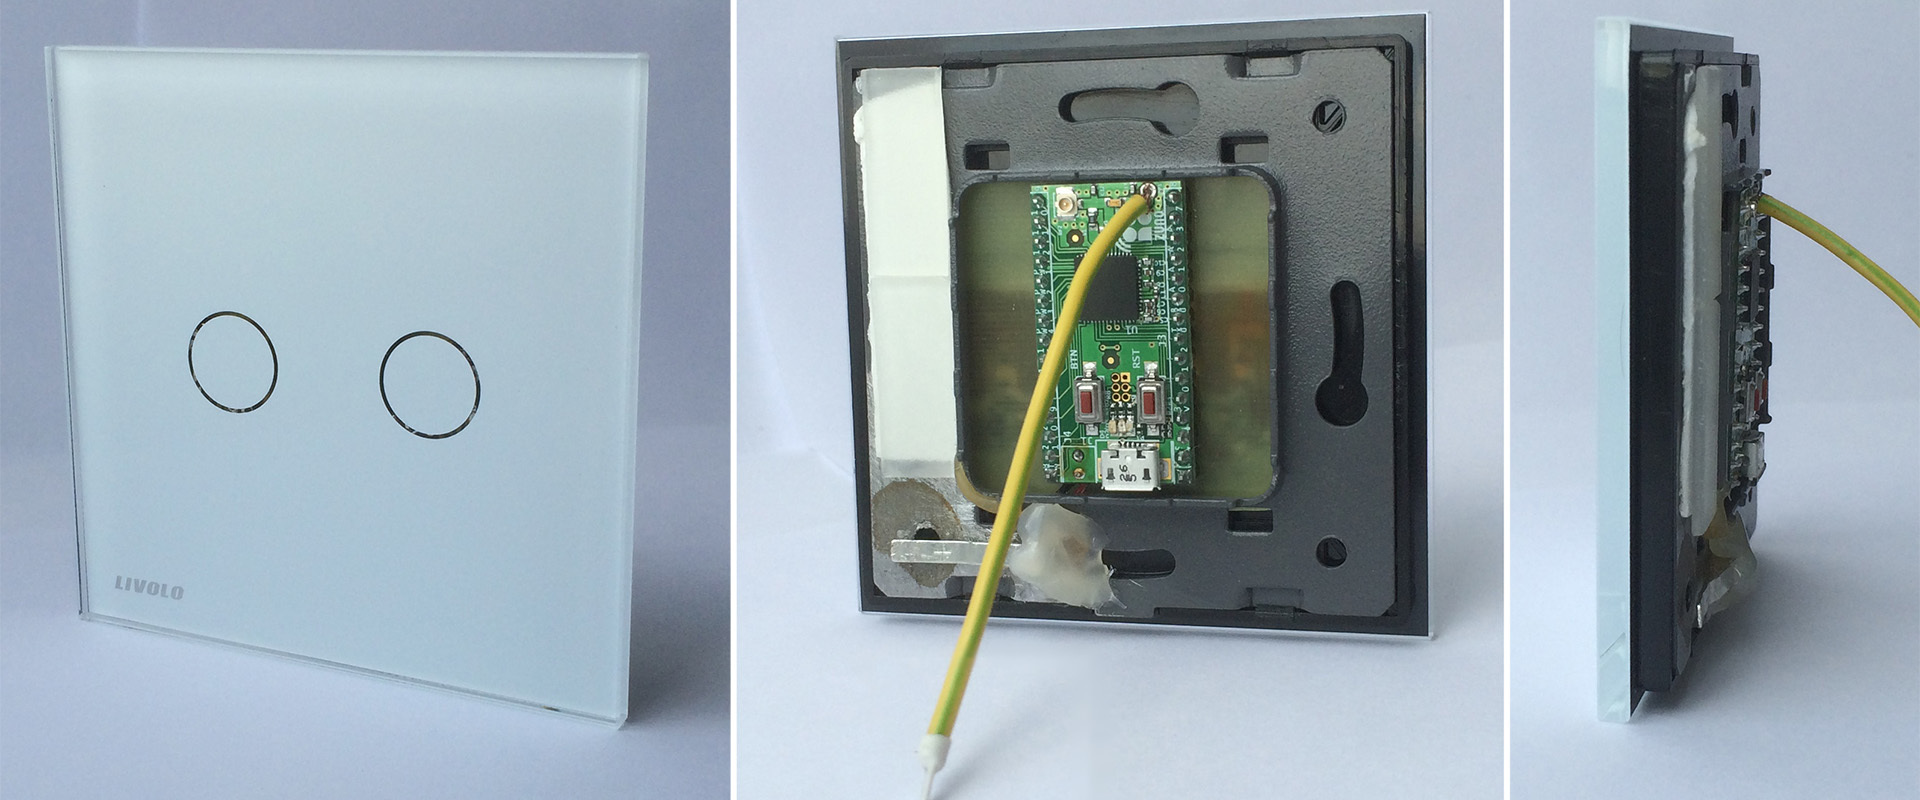 sensor wall switch based on livolo glass